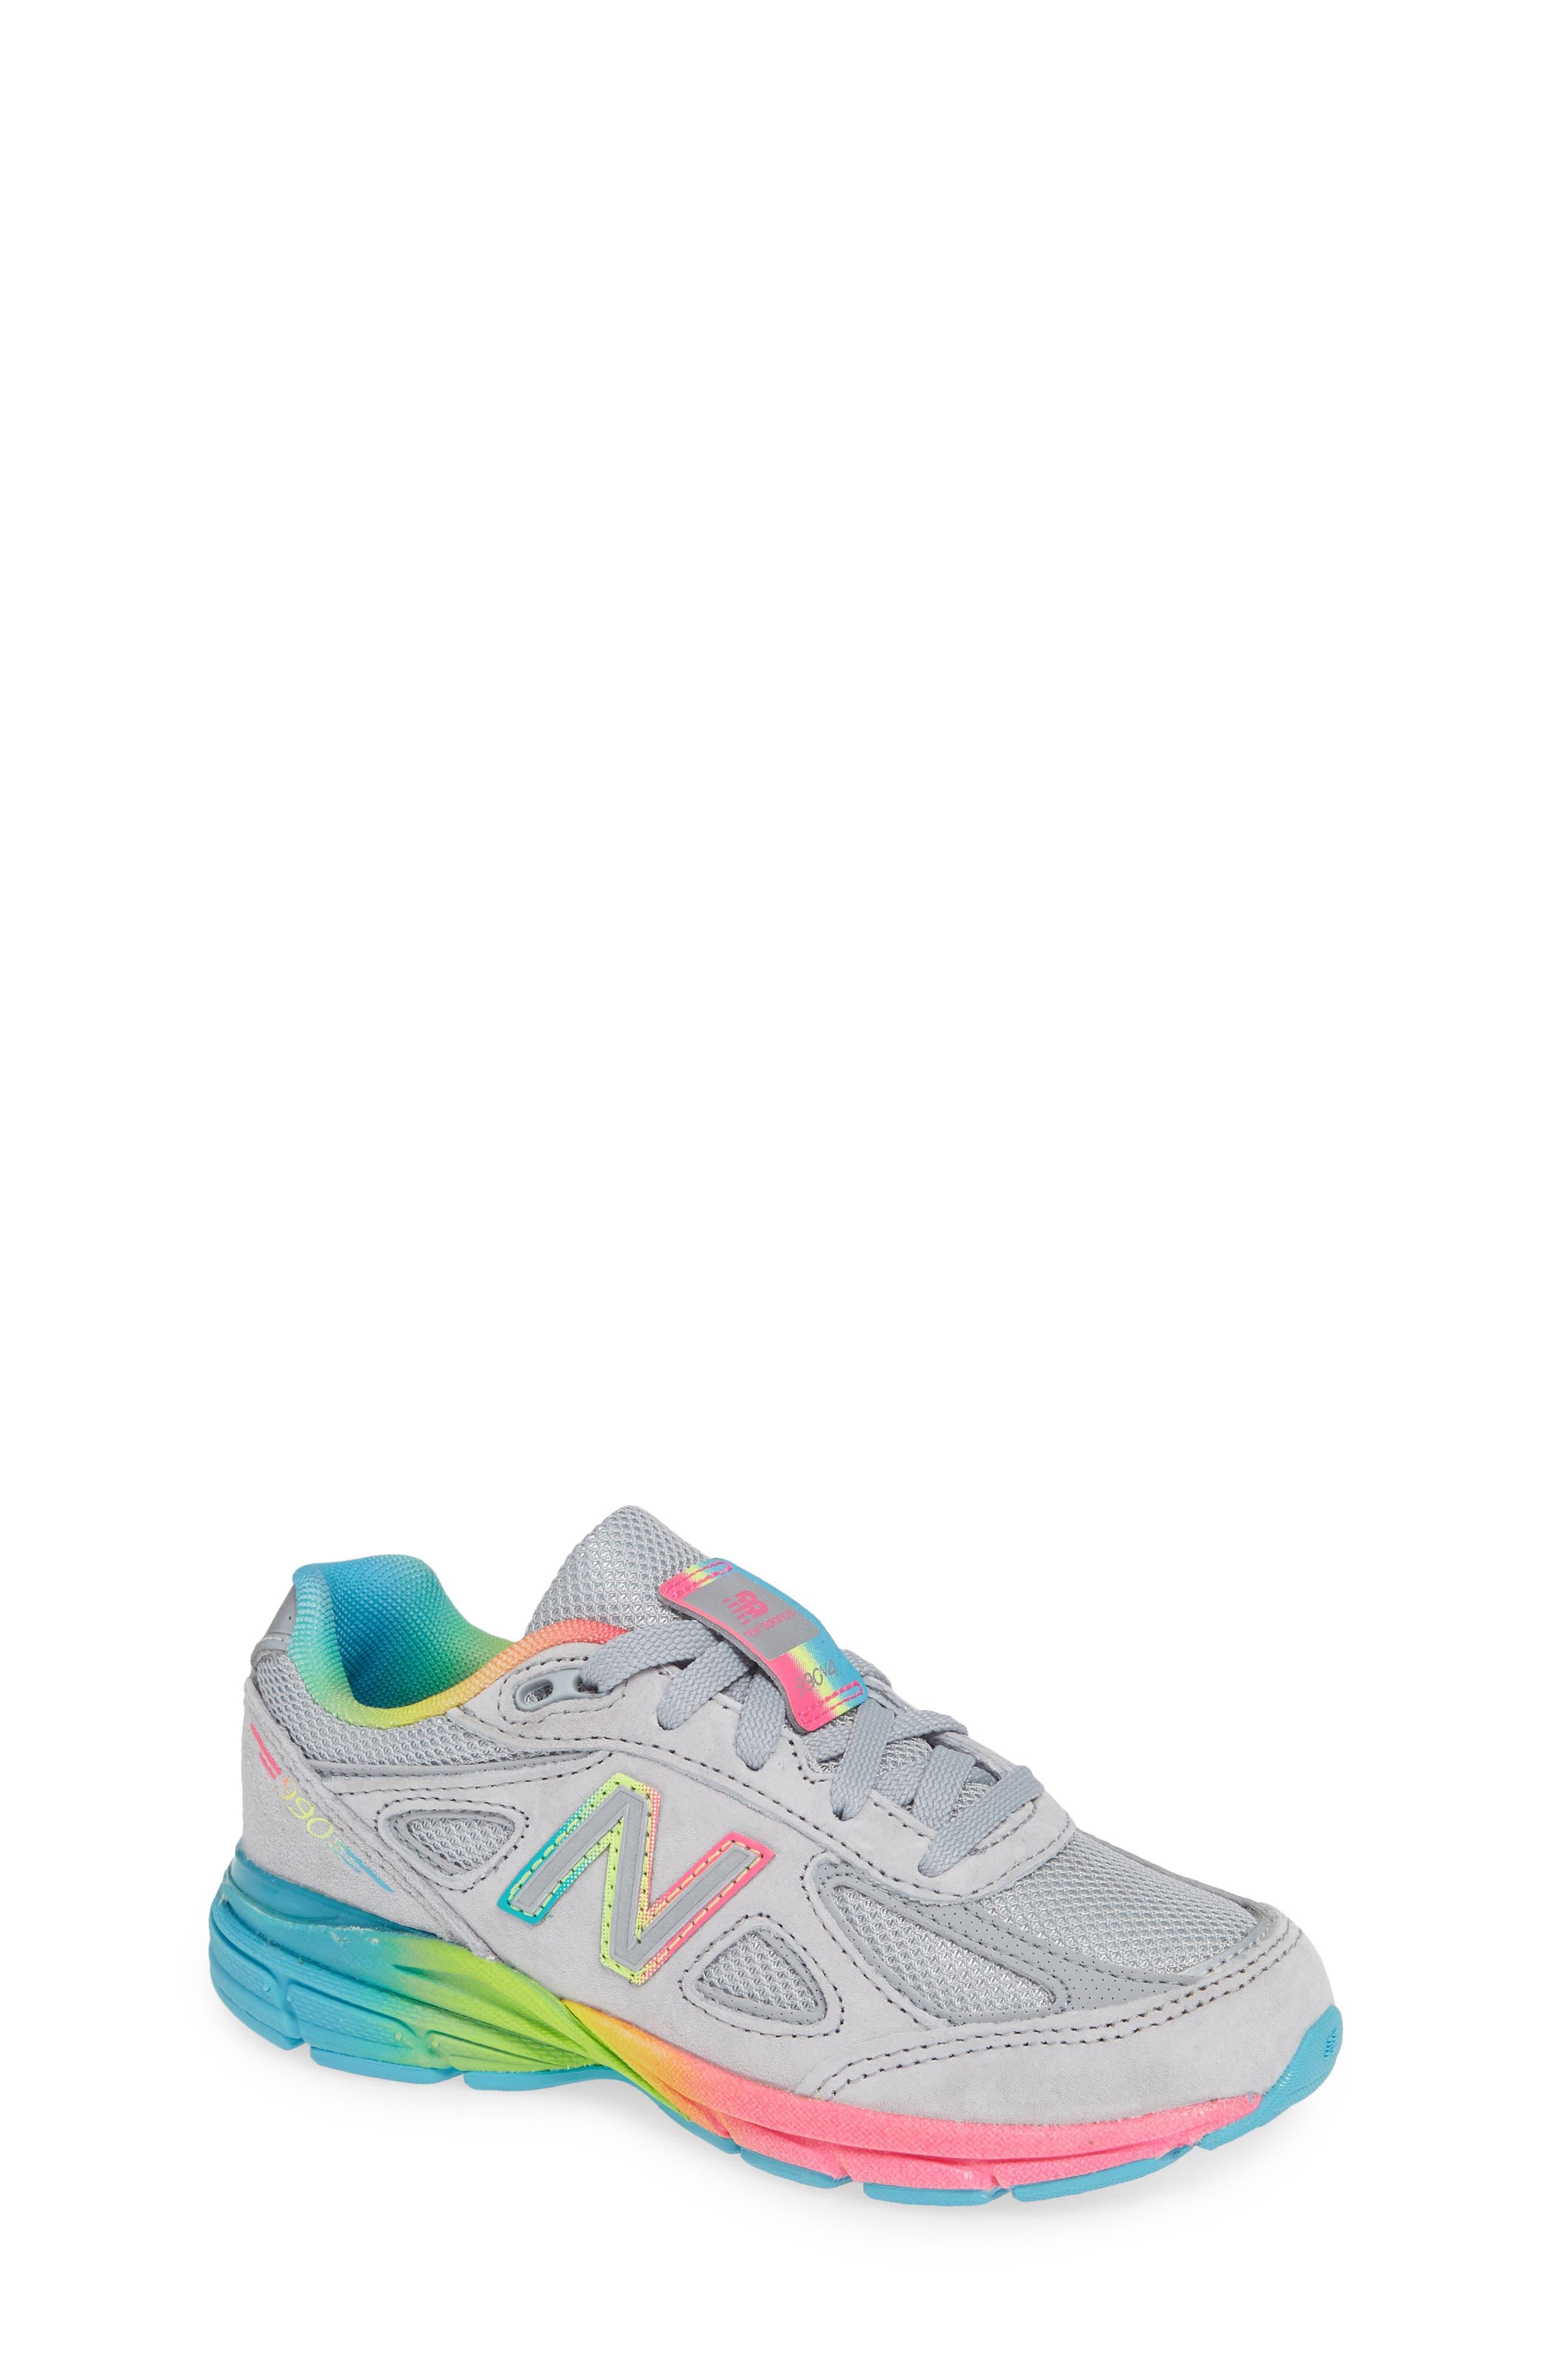 990v4 Sneaker,                             Main thumbnail 1, color,                             ATHLETIC GREY/ MULTI